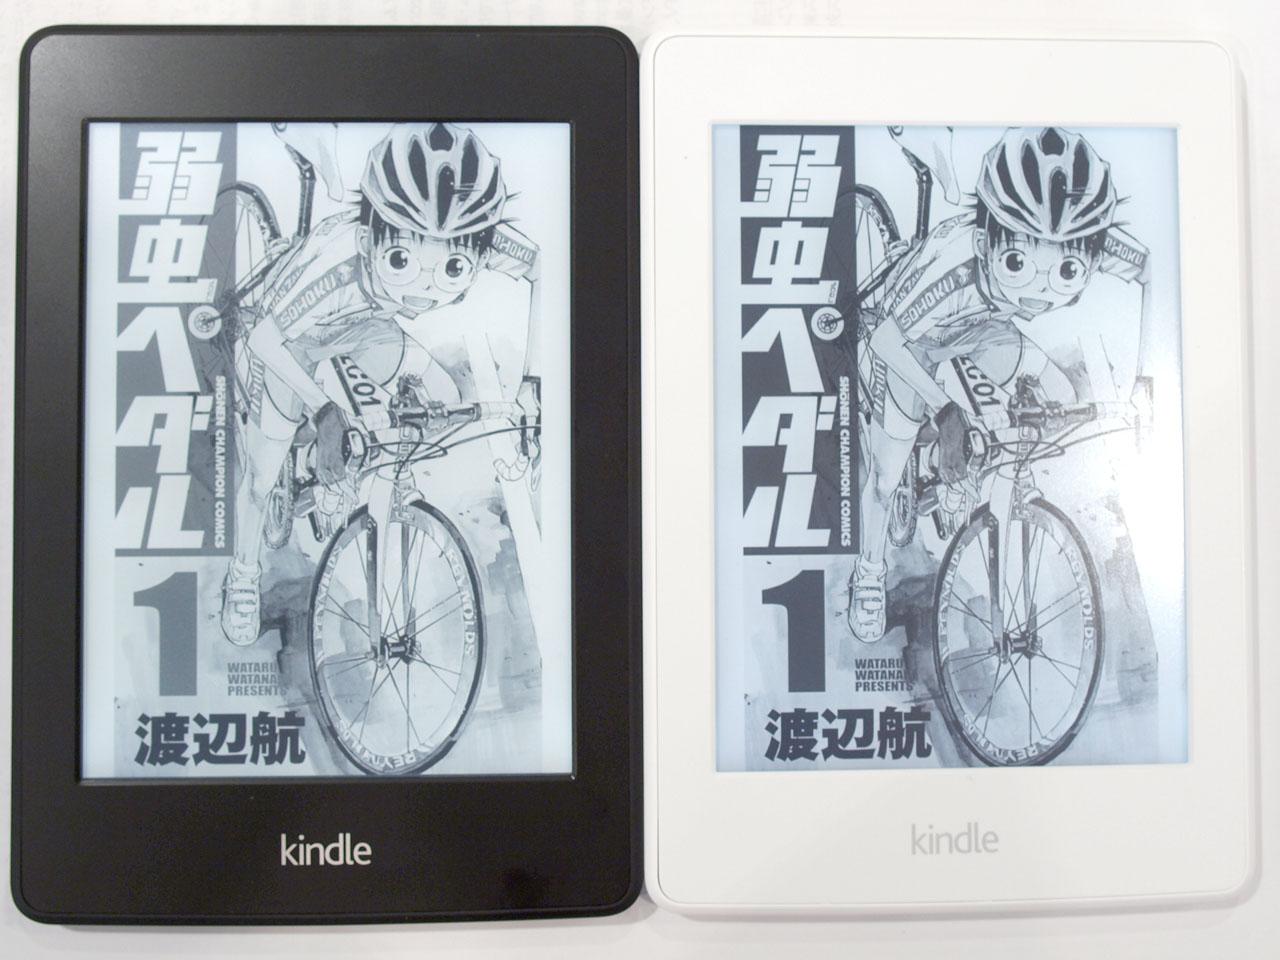 Kindle Paperwhite 32 GB Manga-Modell in Japan erhältlich